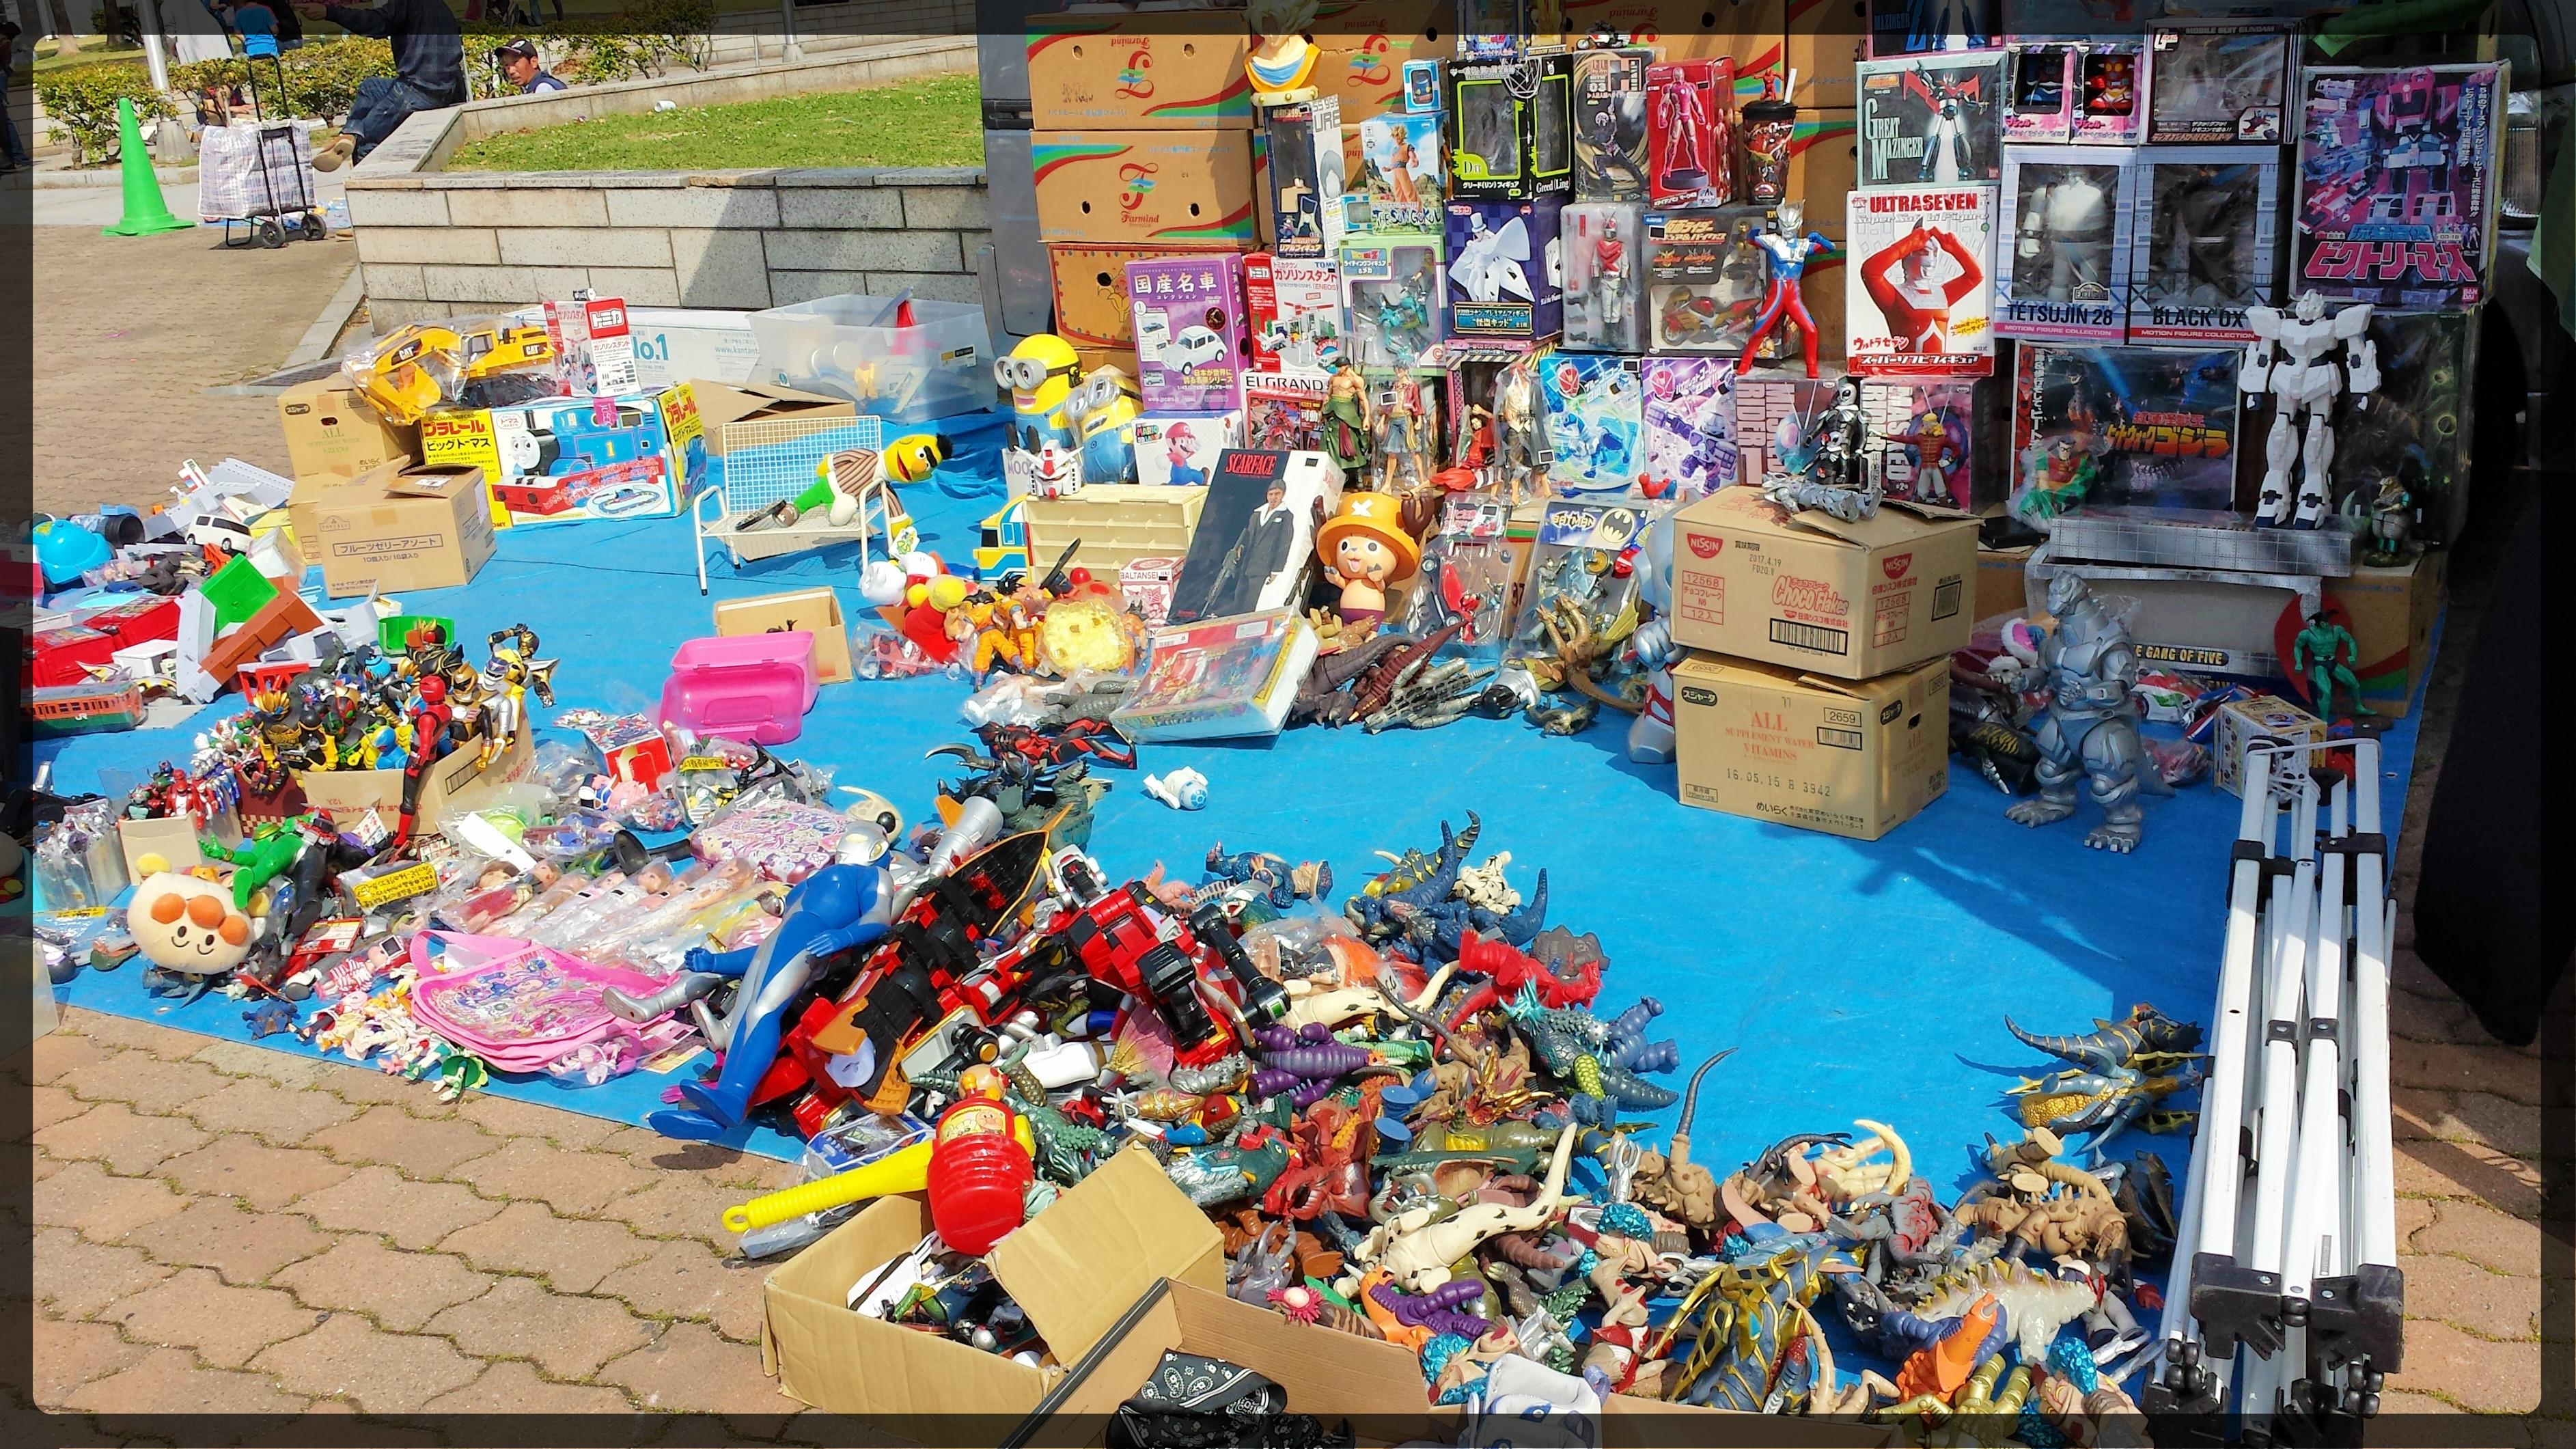 Flea Market at Meriken in Motomachi, Kobe. Toys and figurines for sale.